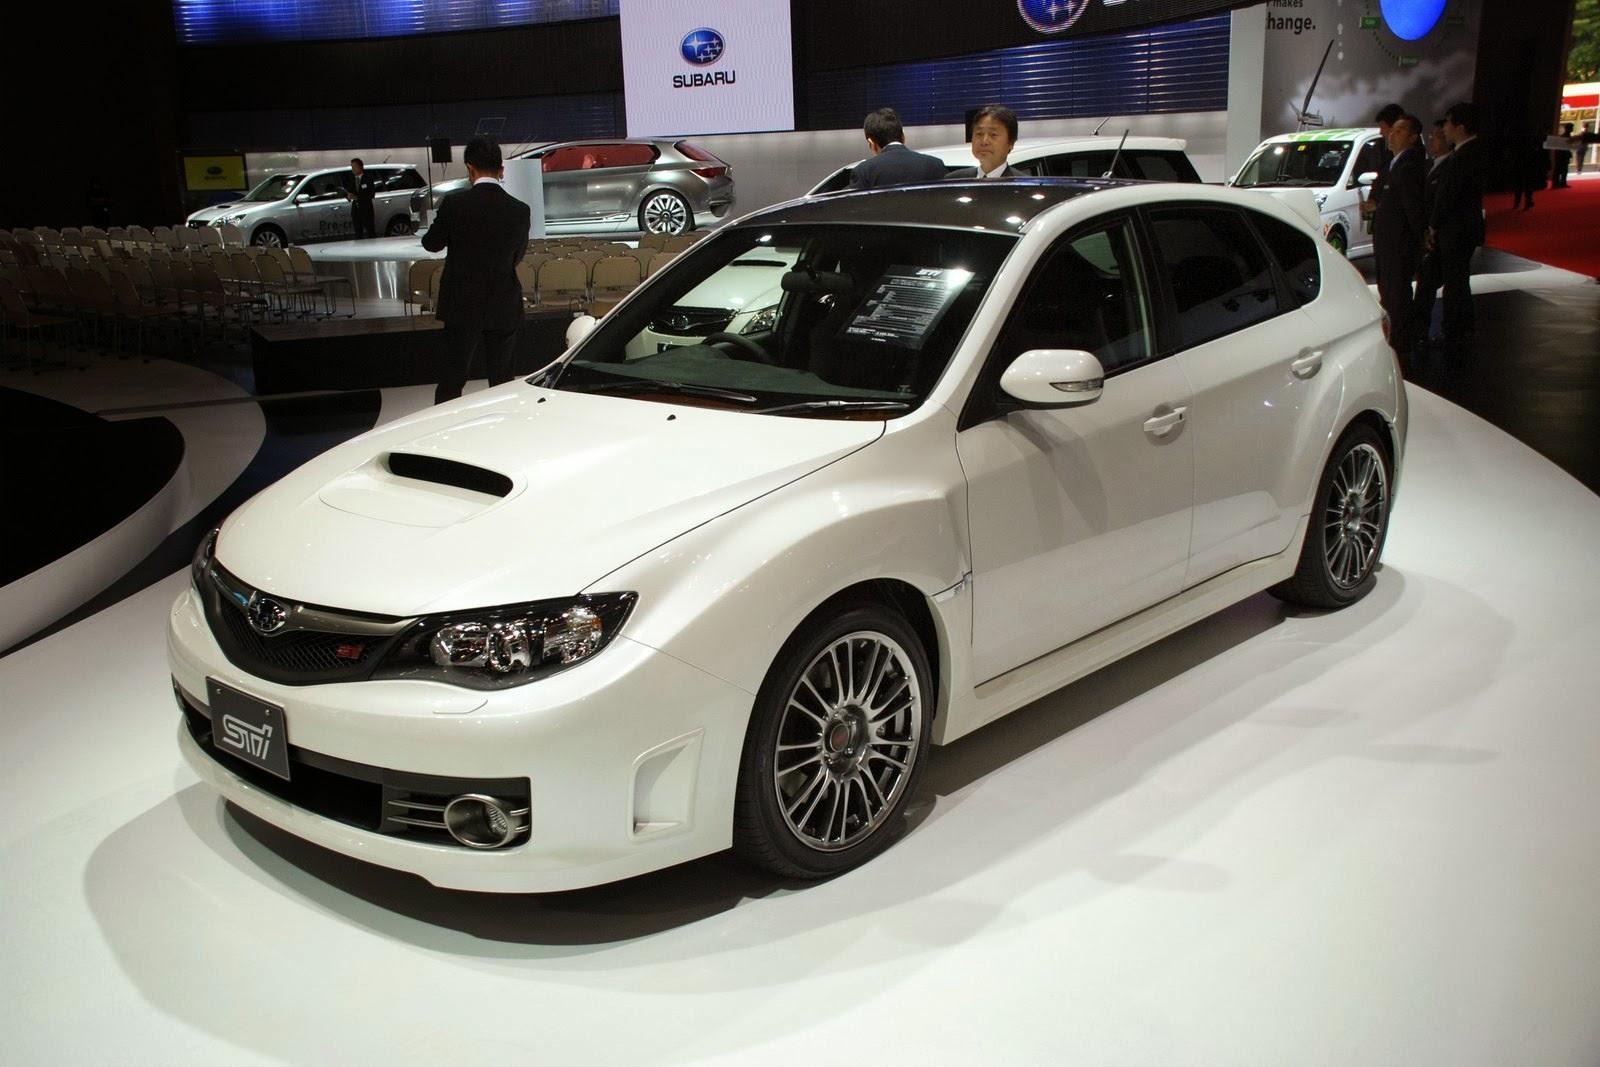 Subaru Impreza Wrx Sti Carbon 2017 Wallpaper Just Welcome To Automotive